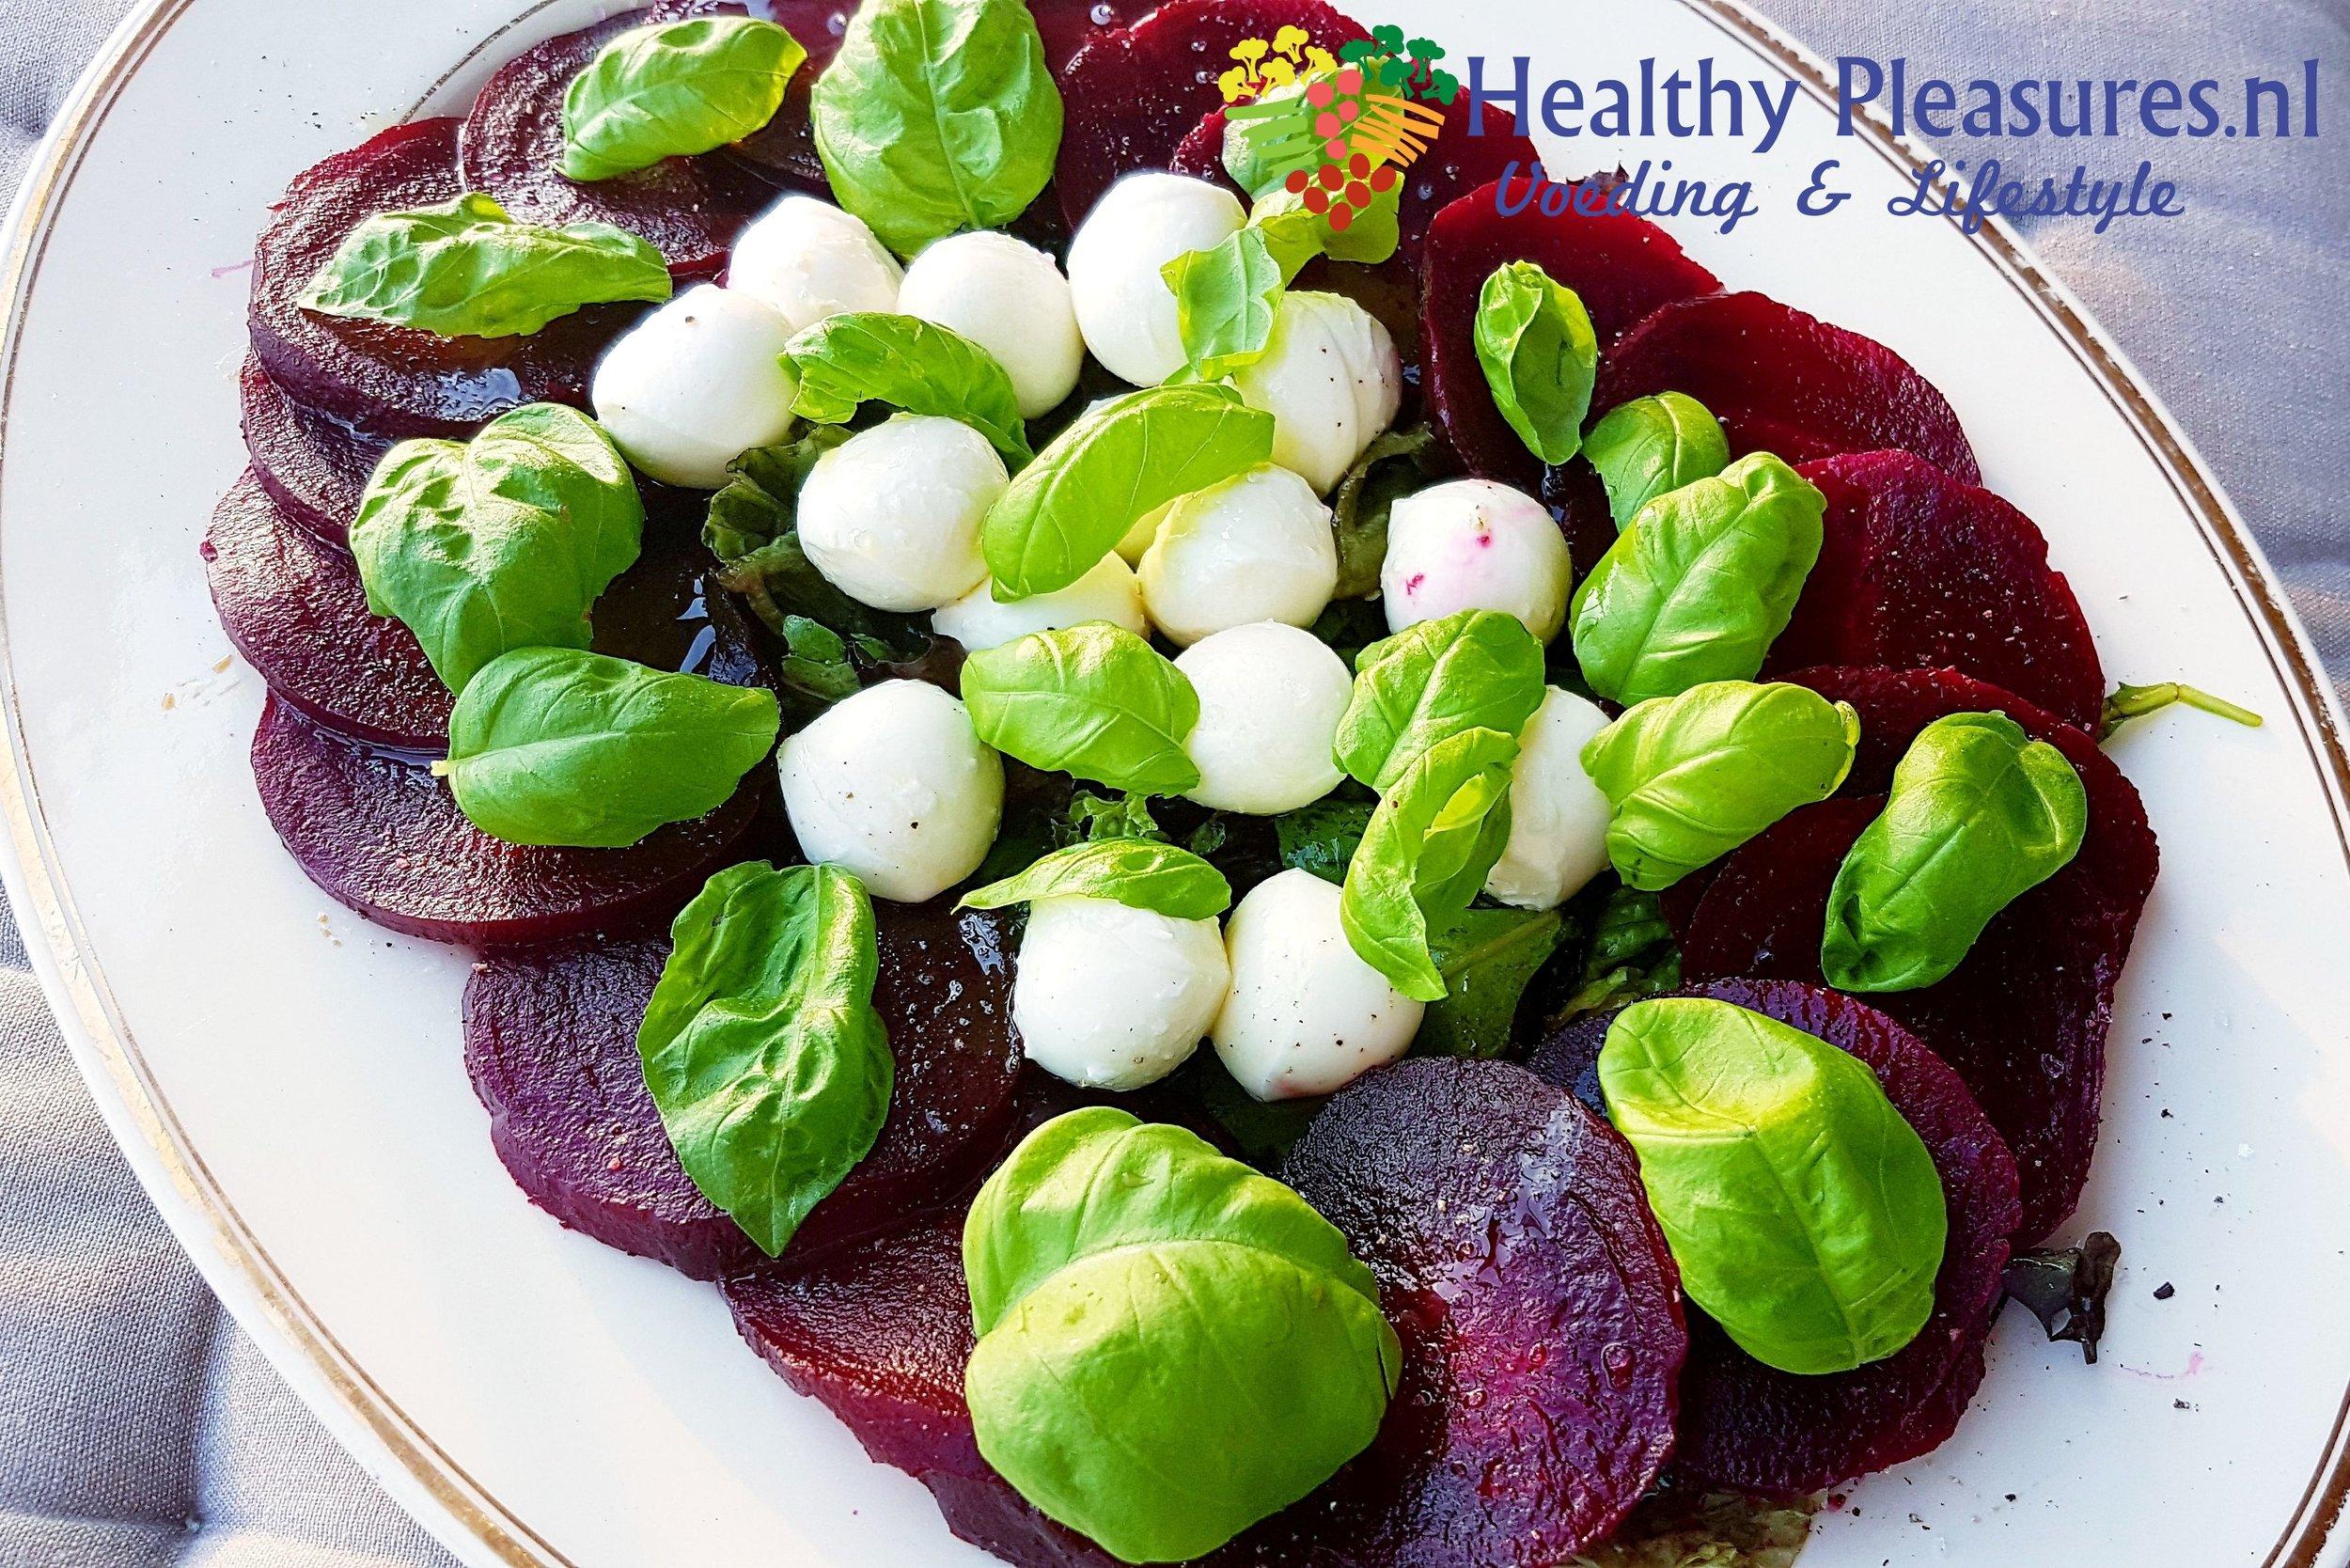 rode biet mozzarella basilicum voorgerecht avondeten.jpg